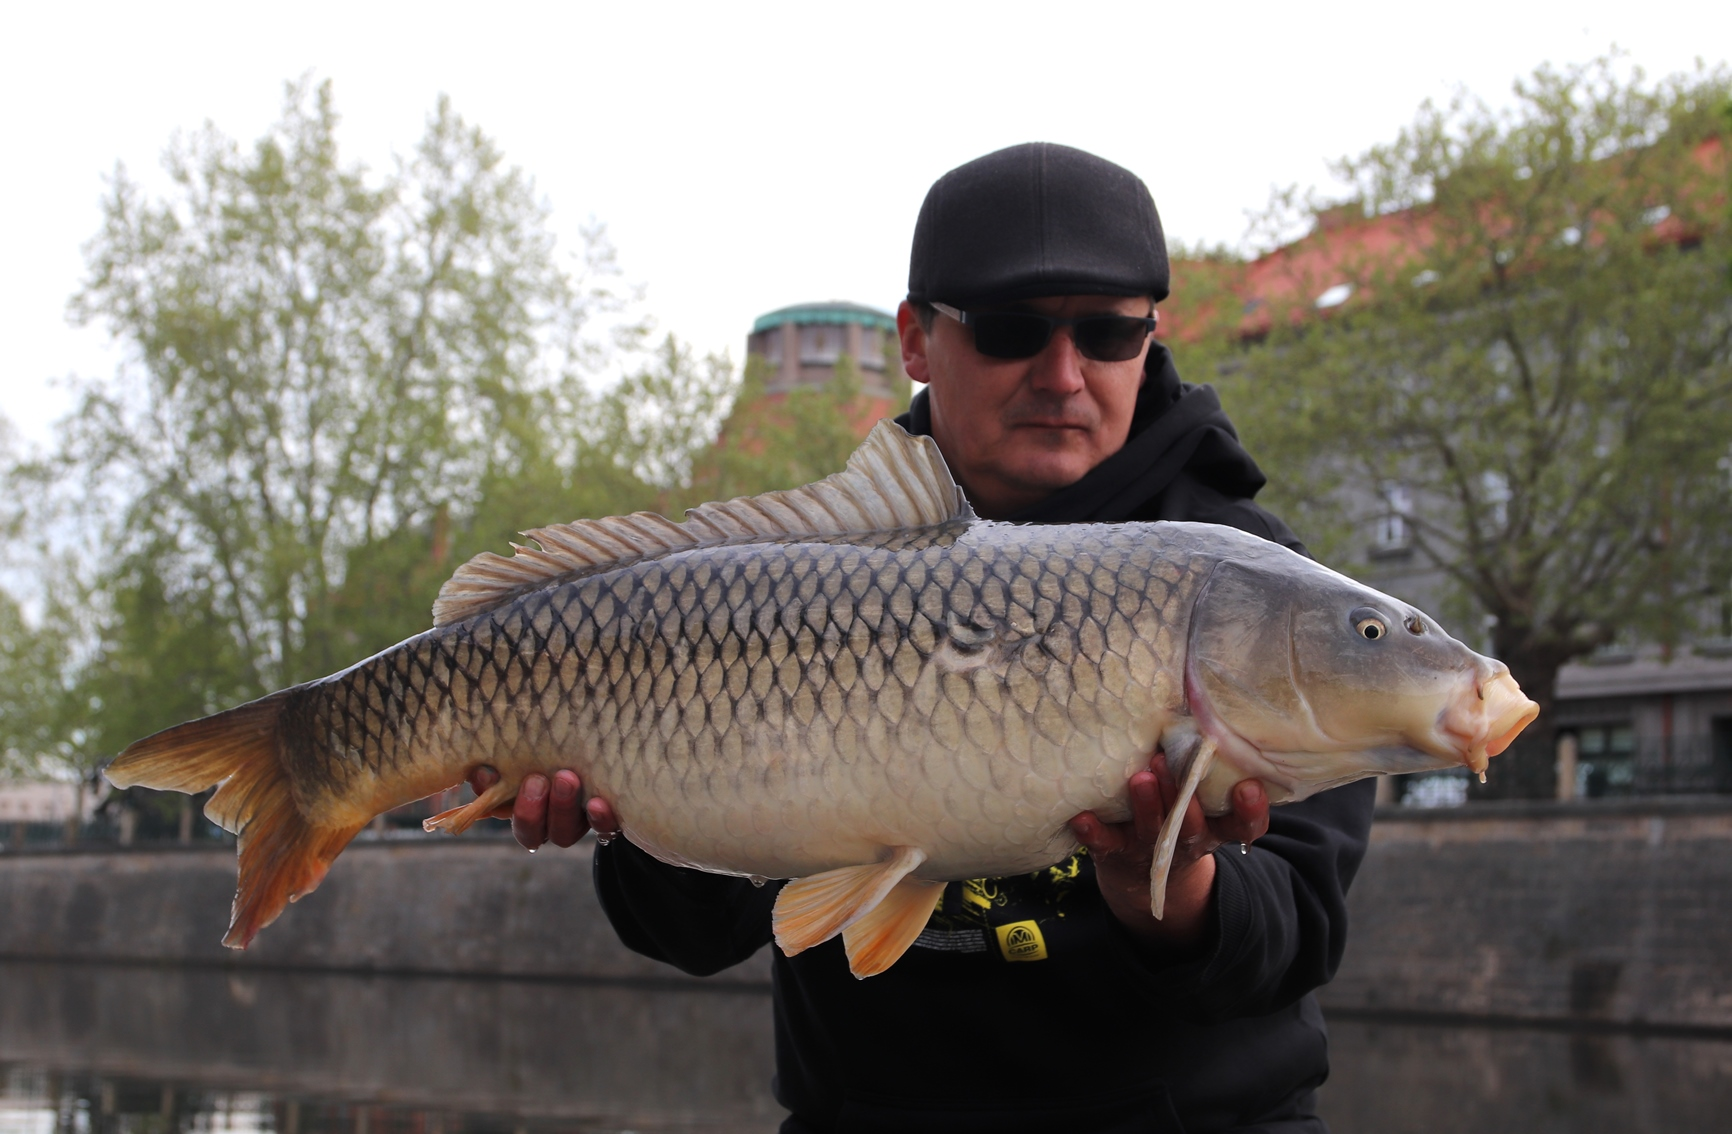 Boilies Mivardi Rapid Easy Catch Česnek & Chilli 3300 gr 24 mm